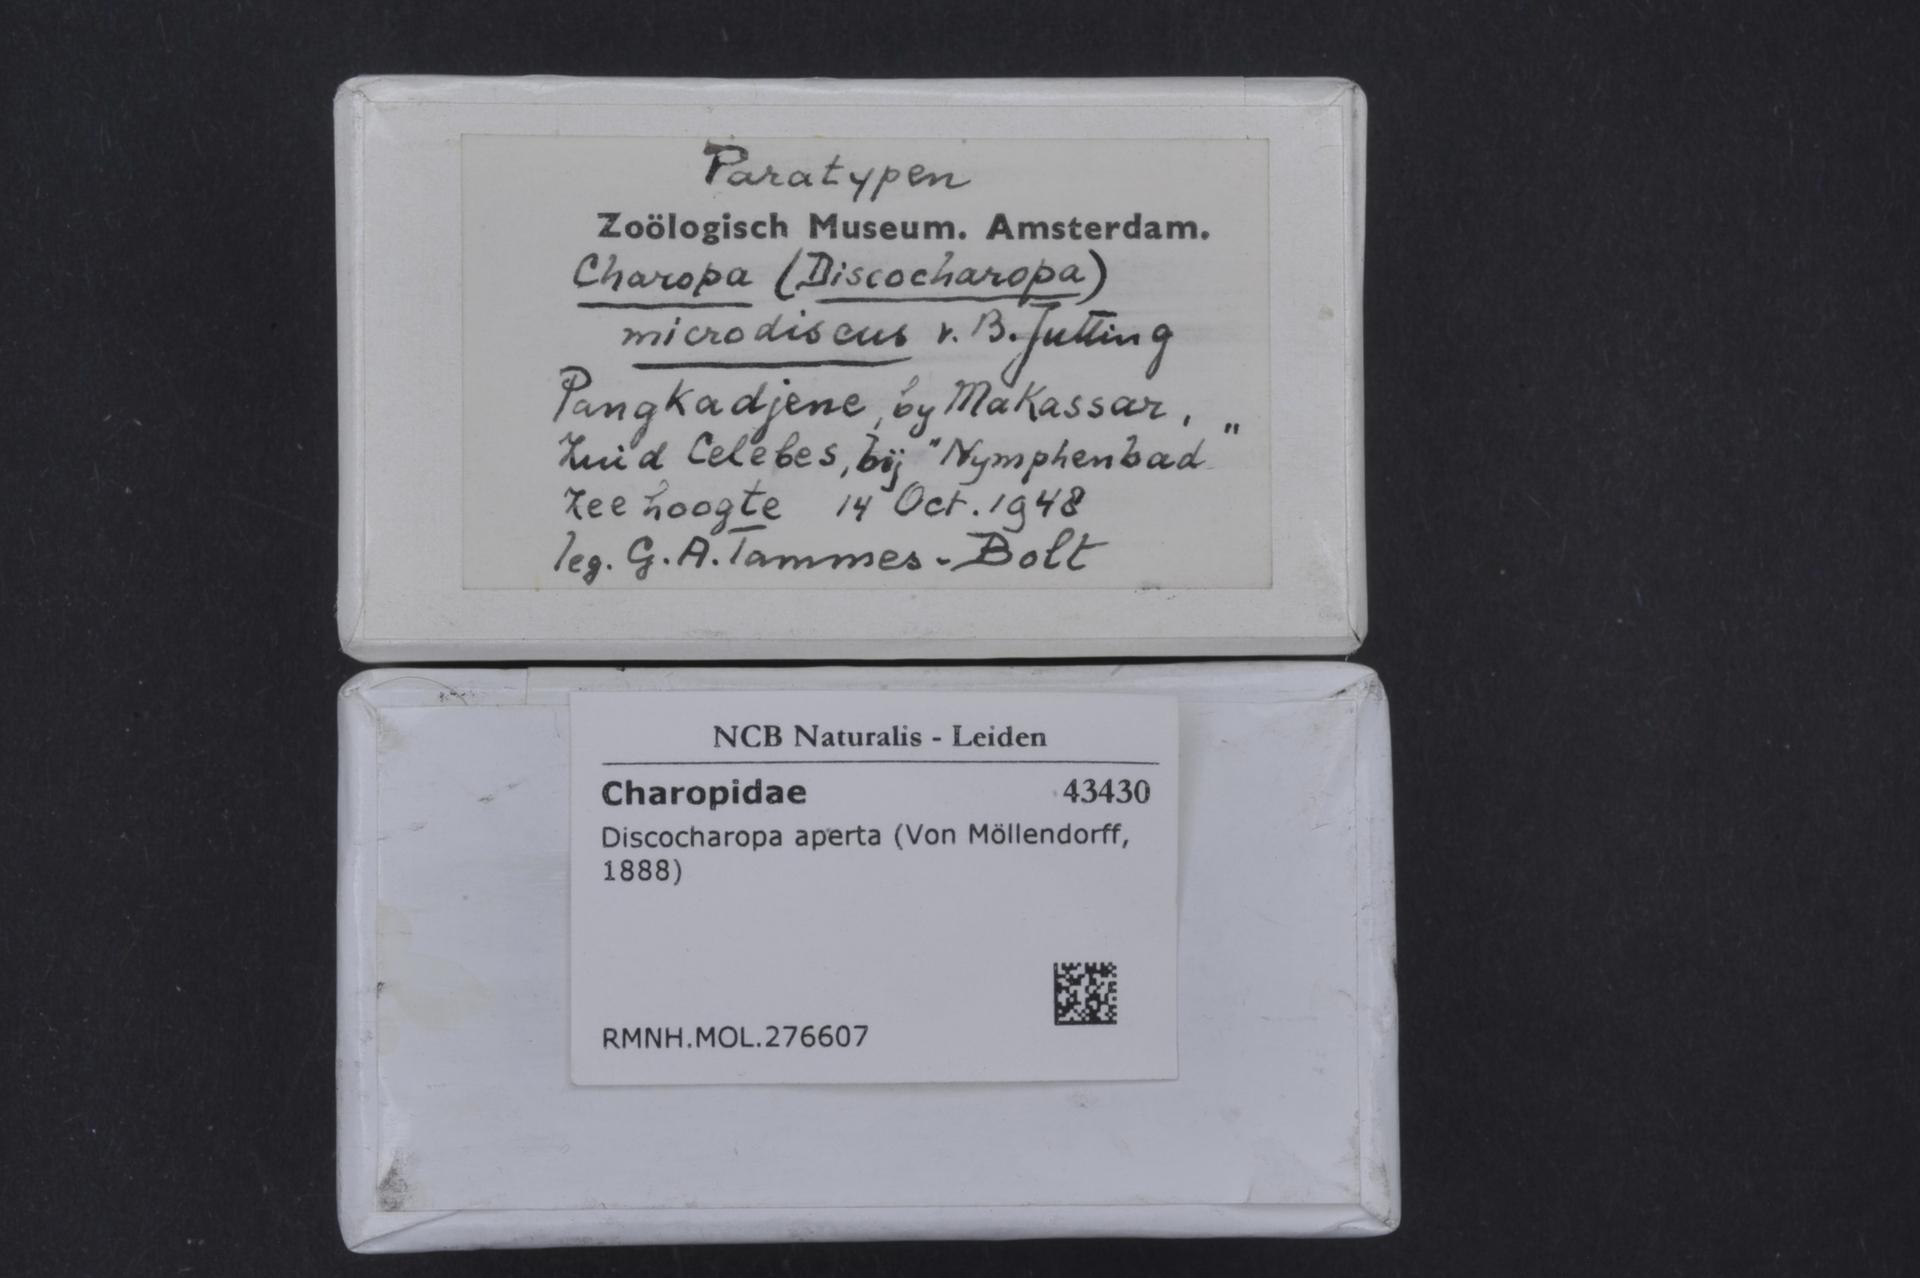 RMNH.MOL.276607   Discocharopa aperta Von Möllendorff, 1888